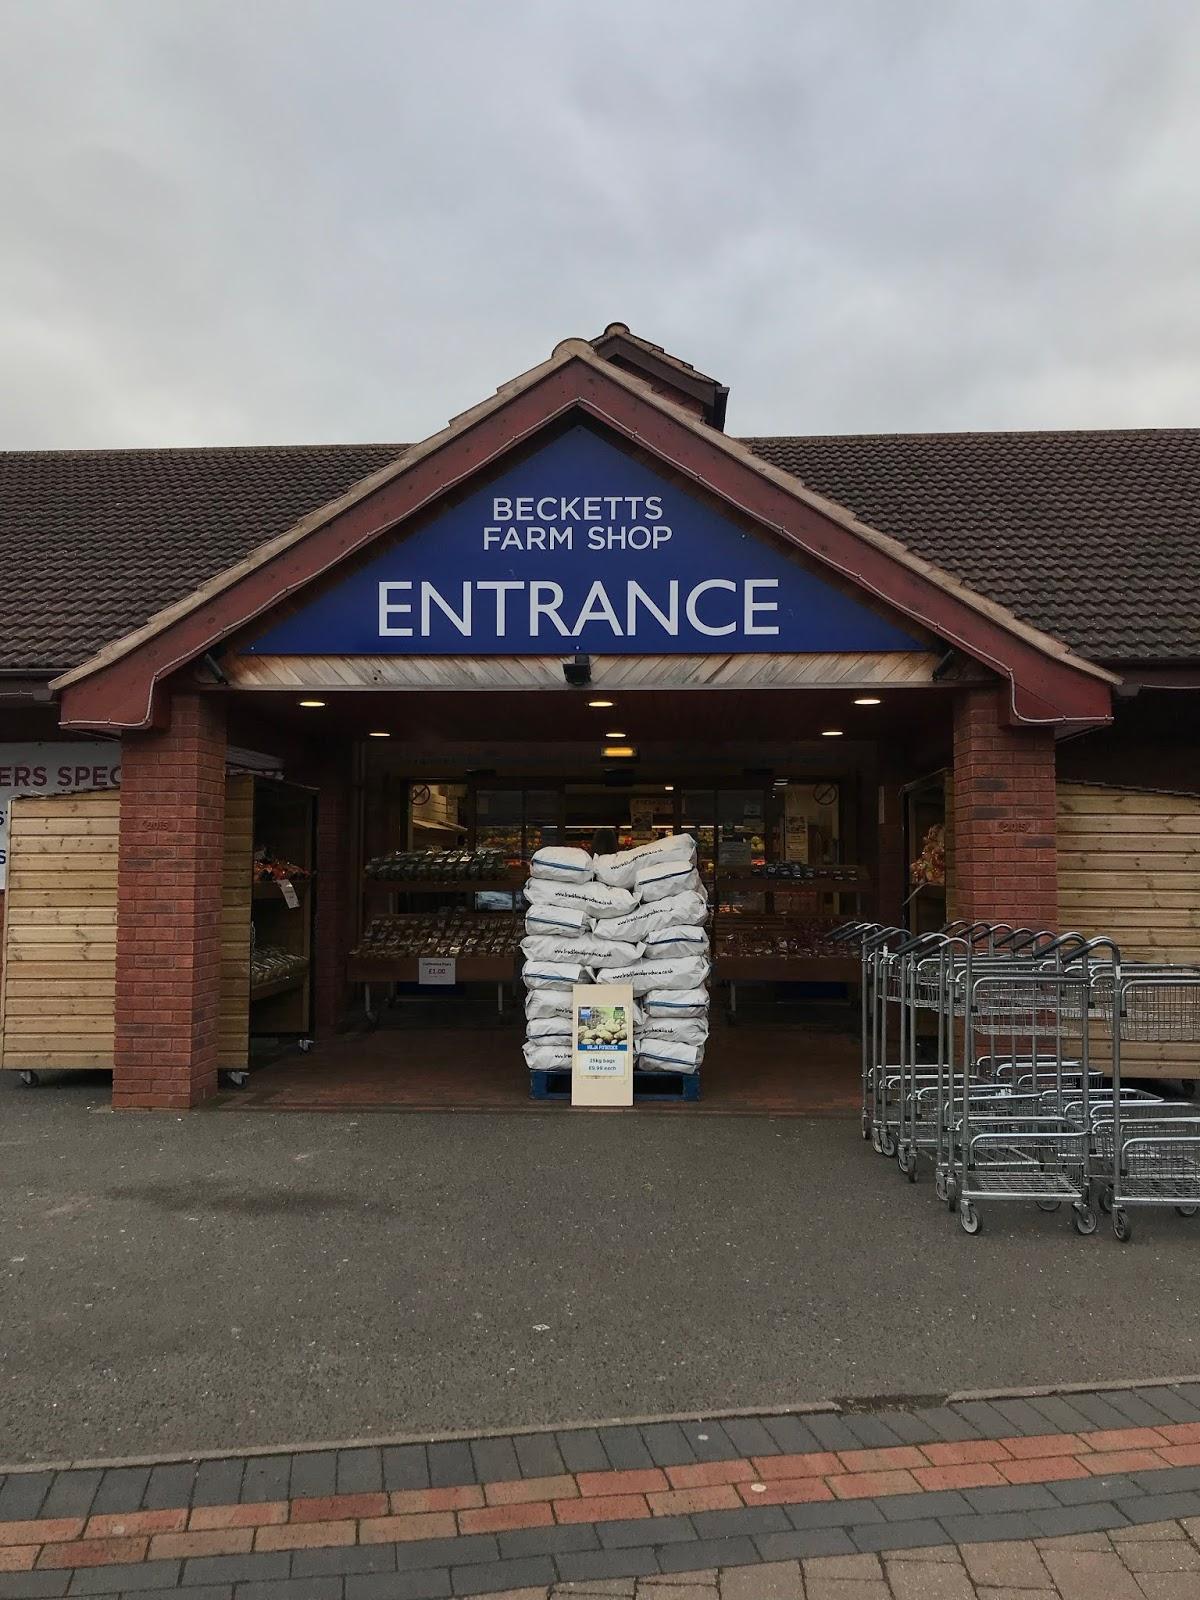 Becketts Farm Shop Entrance